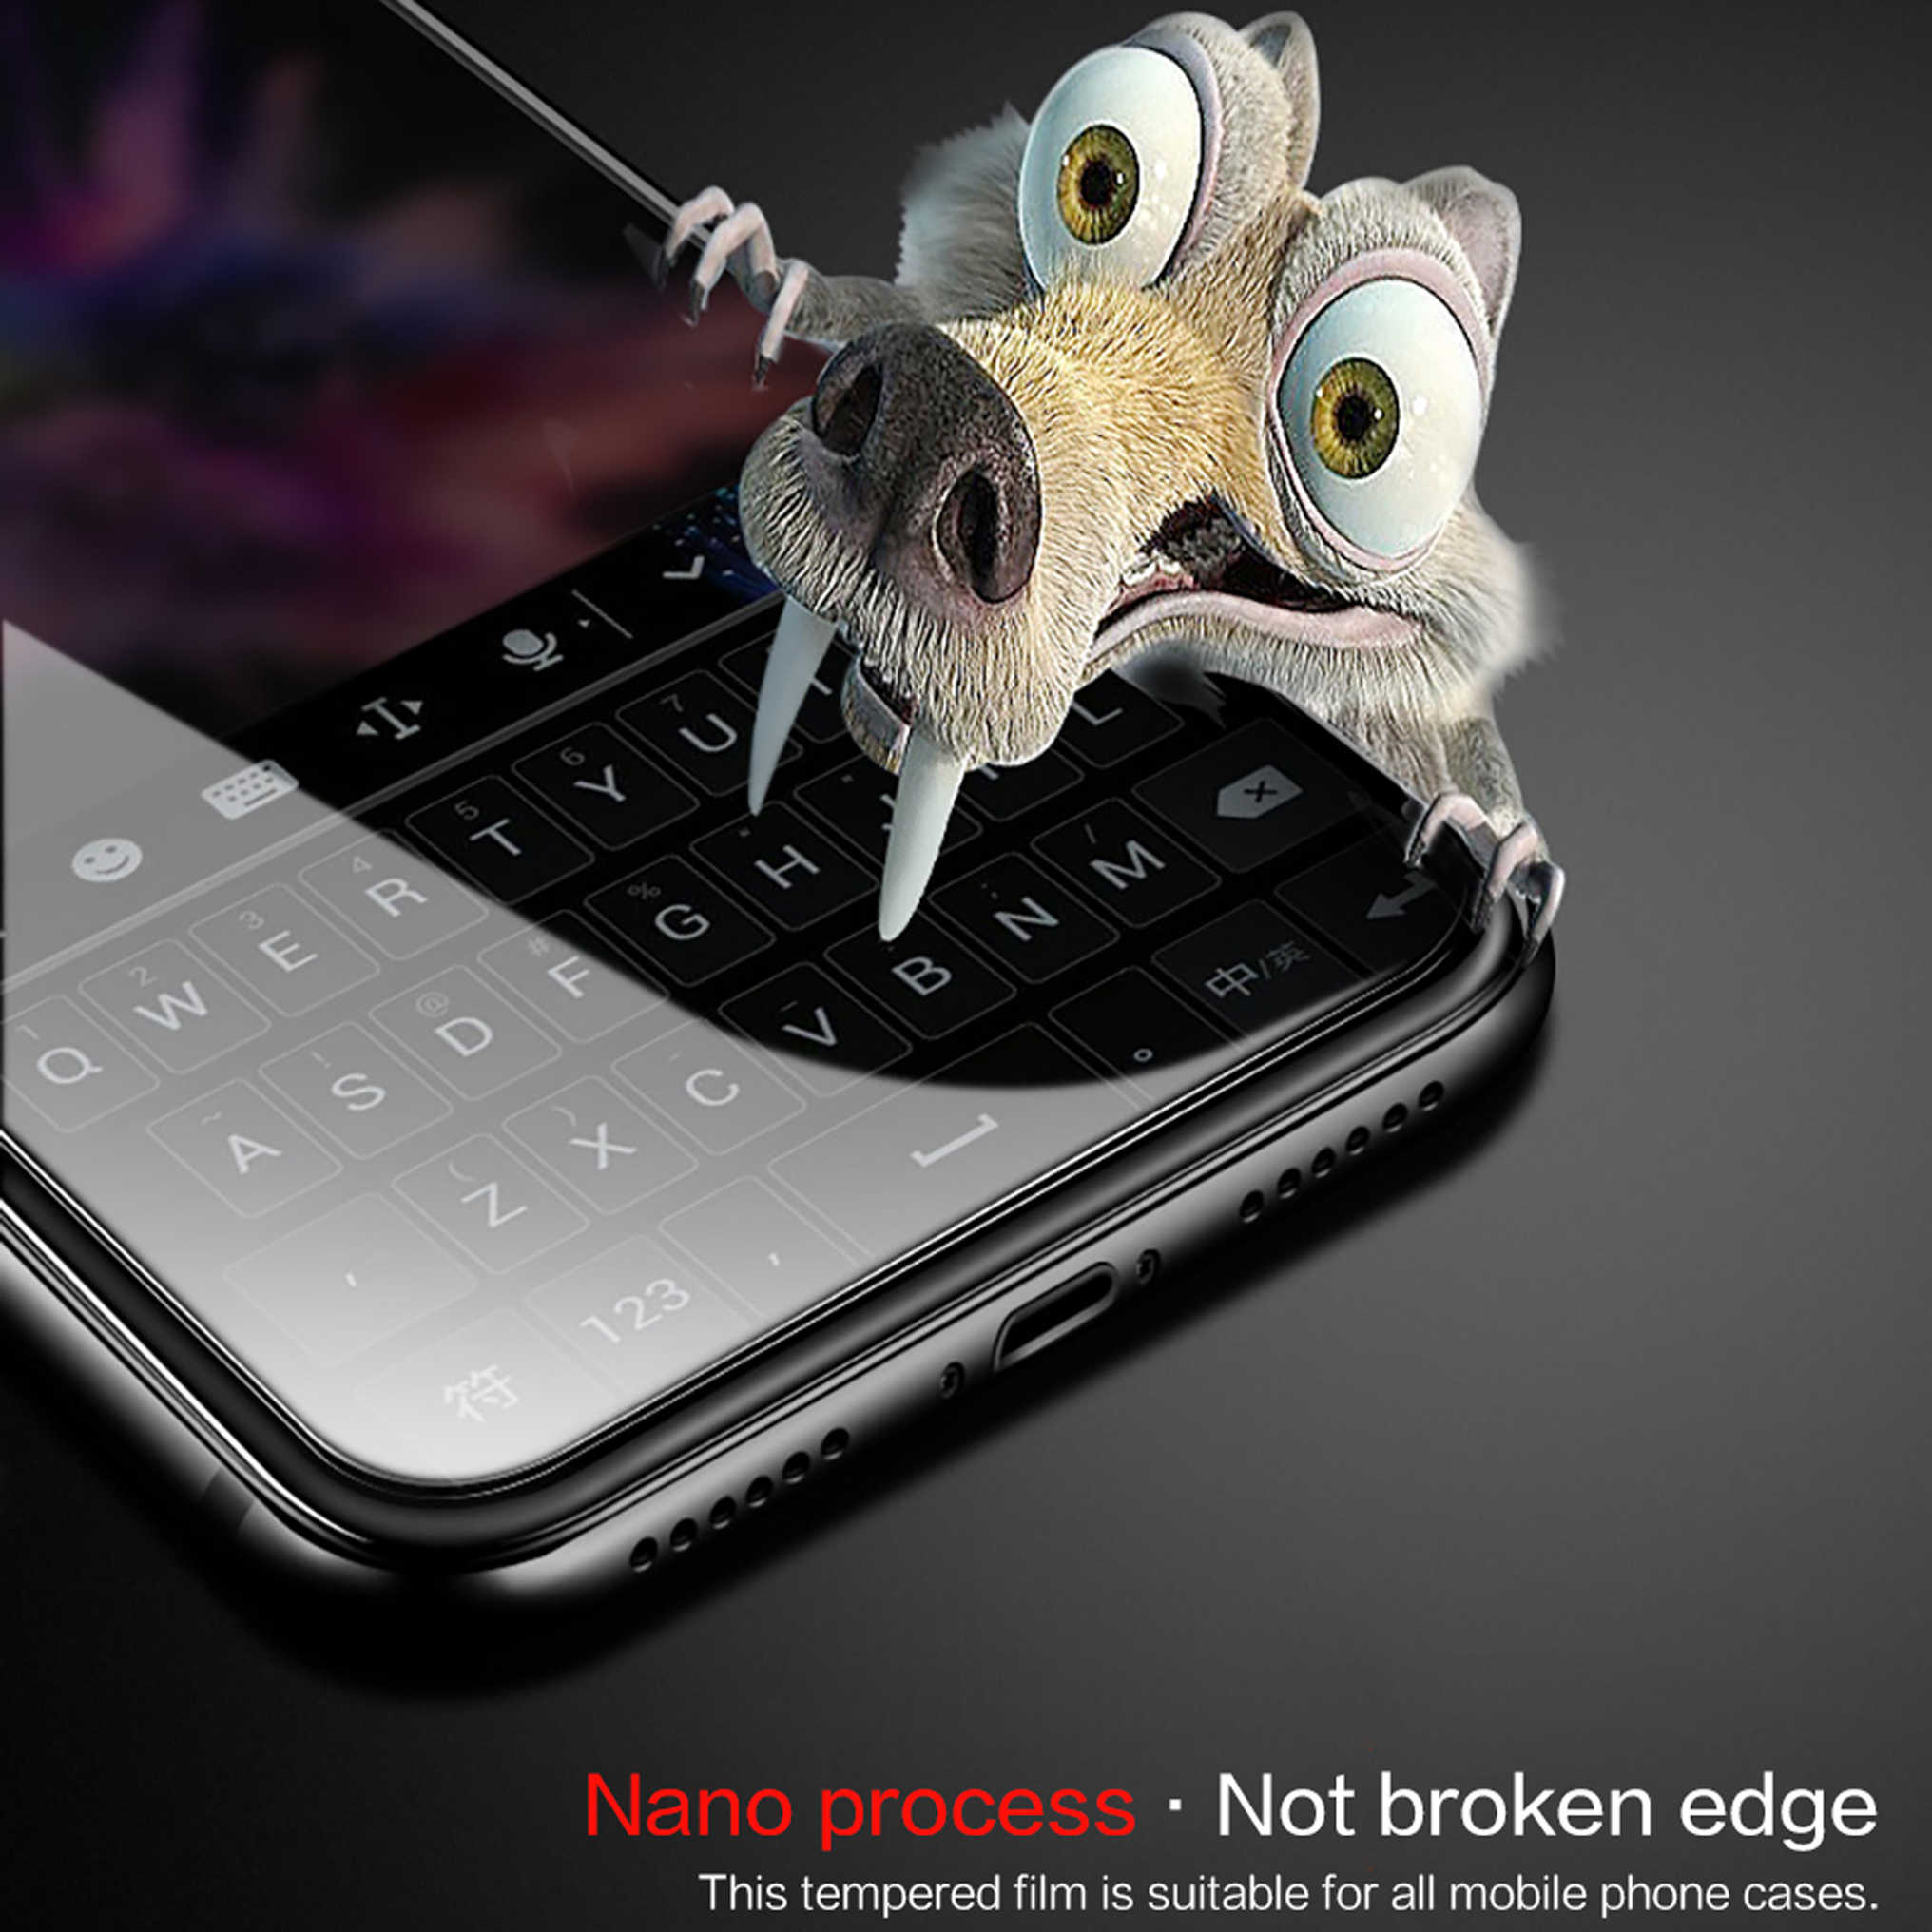 Premium Tempered Glass Pelindung Layar Perlindungan untuk Asus Zenfone Live L1 3 4 Max Pro 5 Lite ZenFone M1 2 3 Laser 4 Selfie